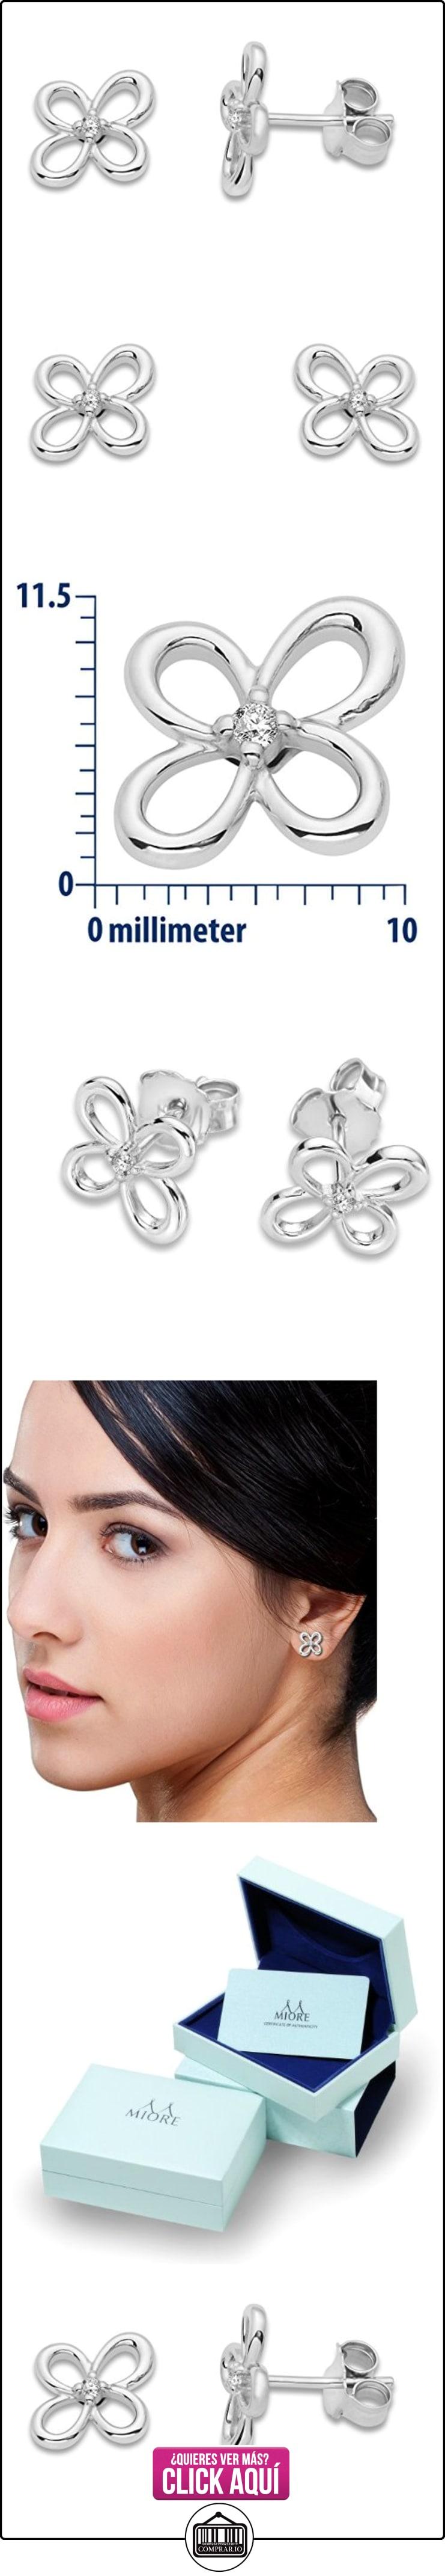 Miore mujer  Plata de ley (925/1000)  plata redondo  perlas agua dulce China blanco circonita FASHIONEARRING  ✿ Joyas para mujer - Las mejores ofertas ✿ ▬► Ver oferta: https://comprar.io/goto/B0152ZY9UY